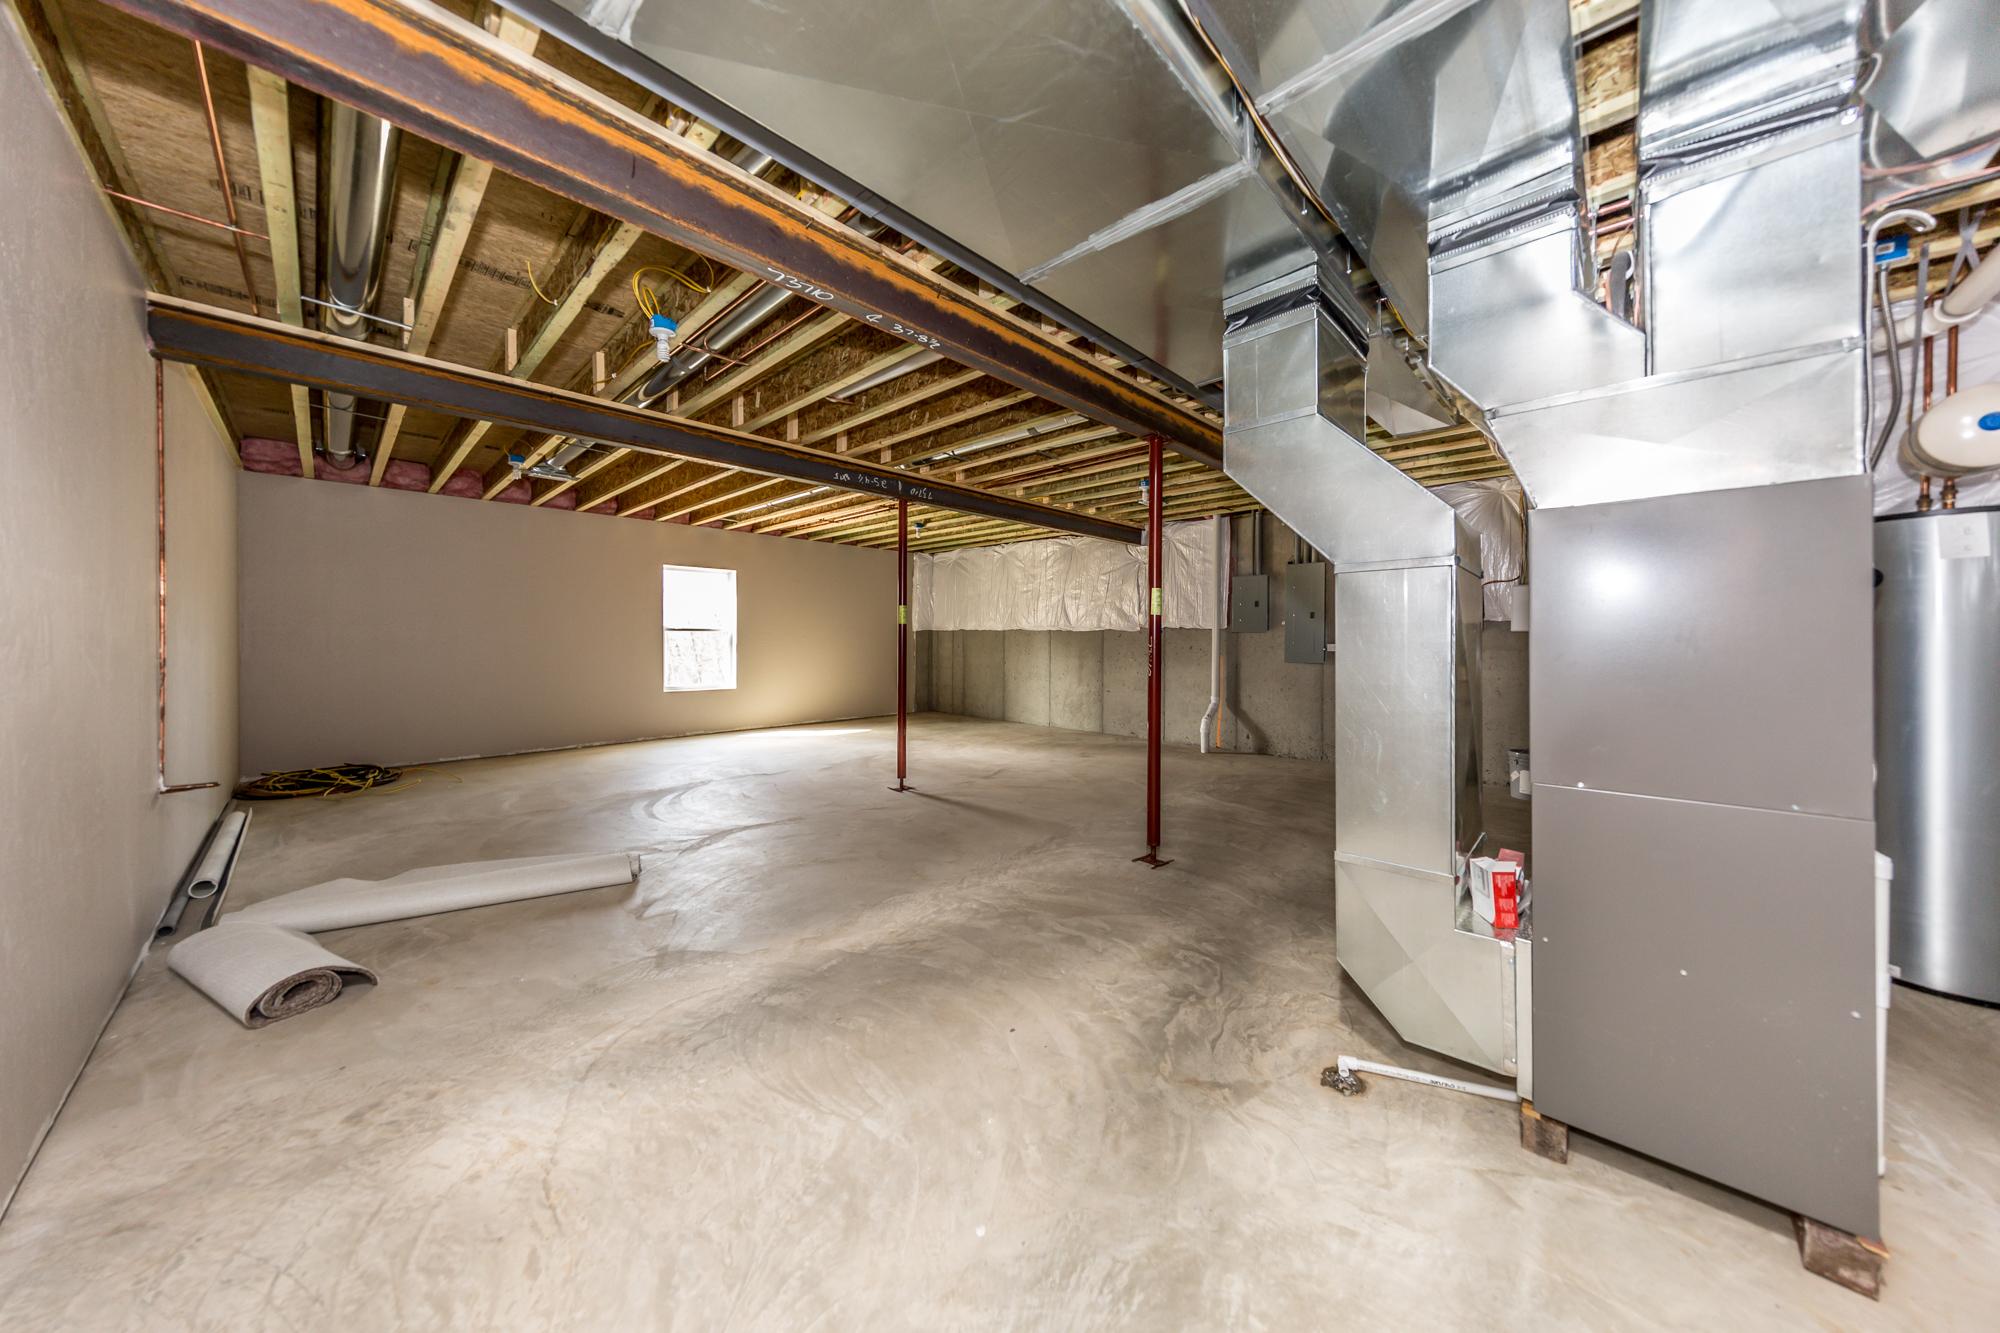 New-Construction-For-Sale-Bethel-Ridge-Farms-Scott-AFB-Illinois-39.jpg